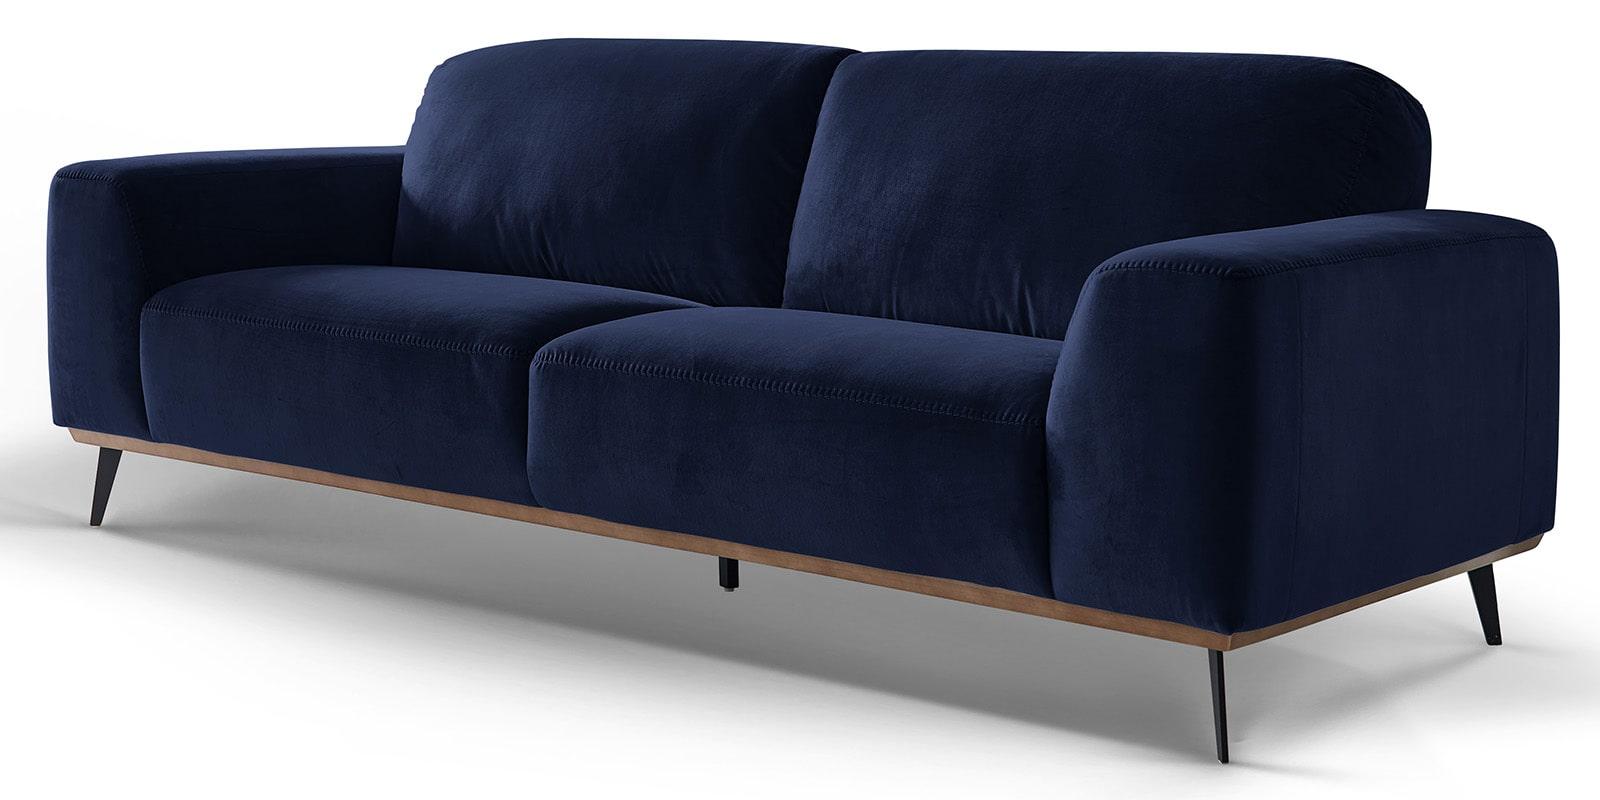 Moebella24 - 3-Sitzer - Sofa - Barcelona - Samt - Dunkelblau - Skandinavisches - Design - Punto - cavallo - Nähte - Detailaufnahme